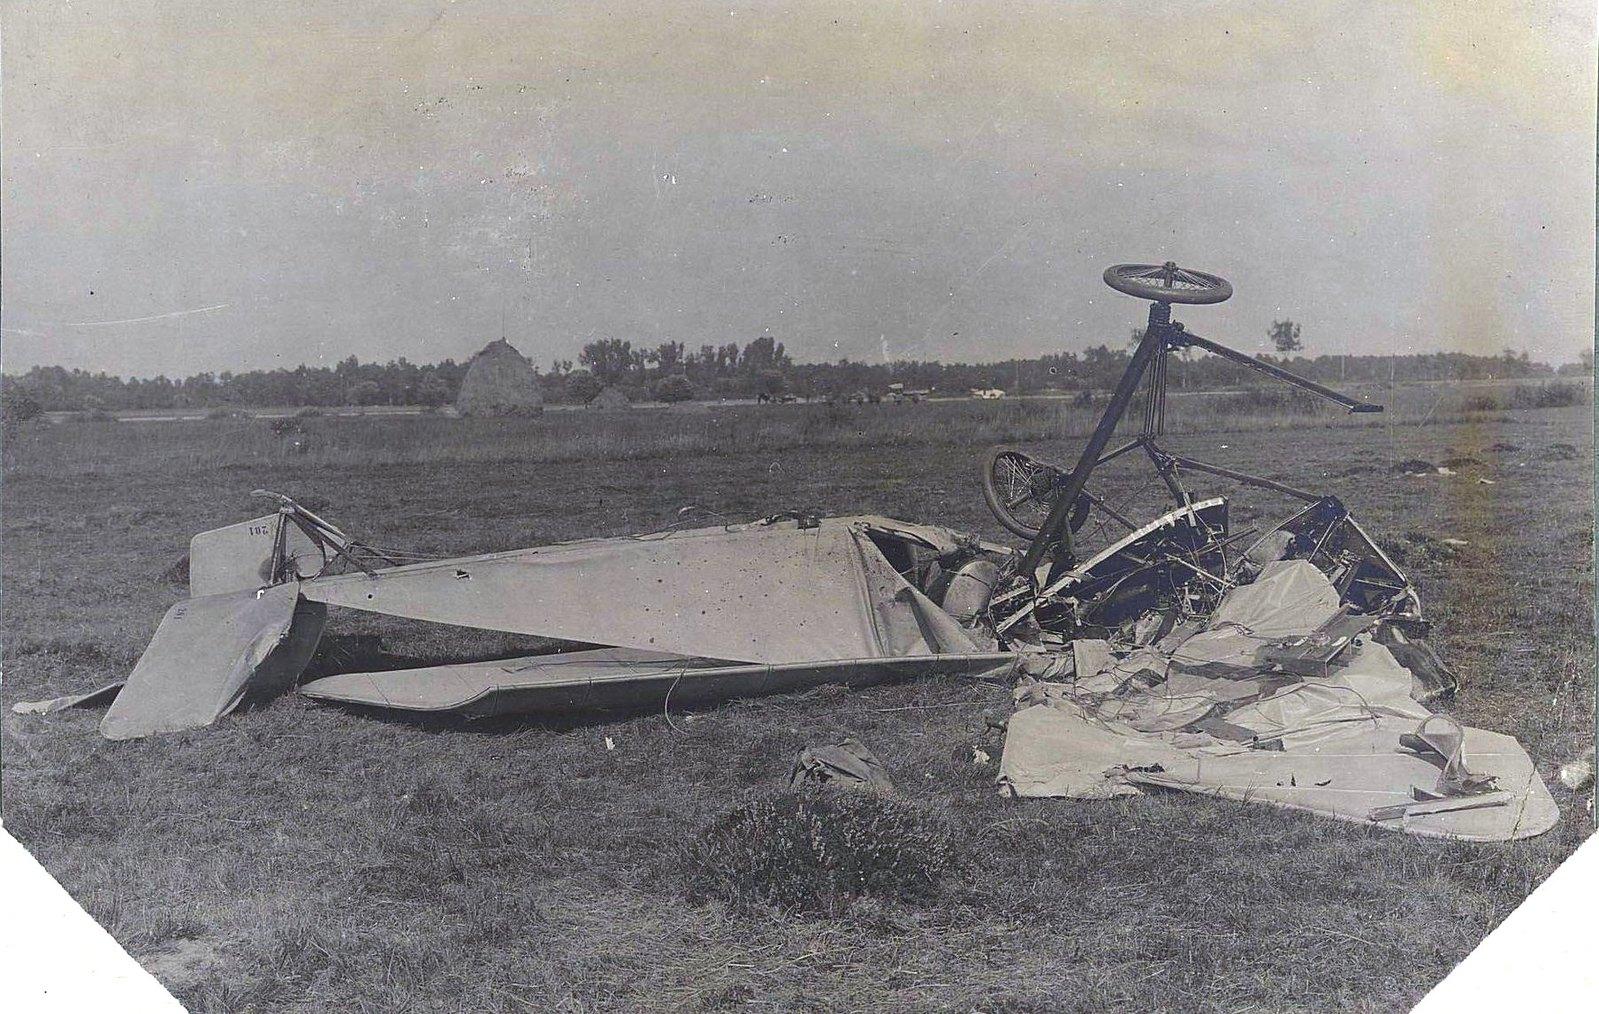 1914. Оболочка «Морана», на котором погиб П.Нестеров